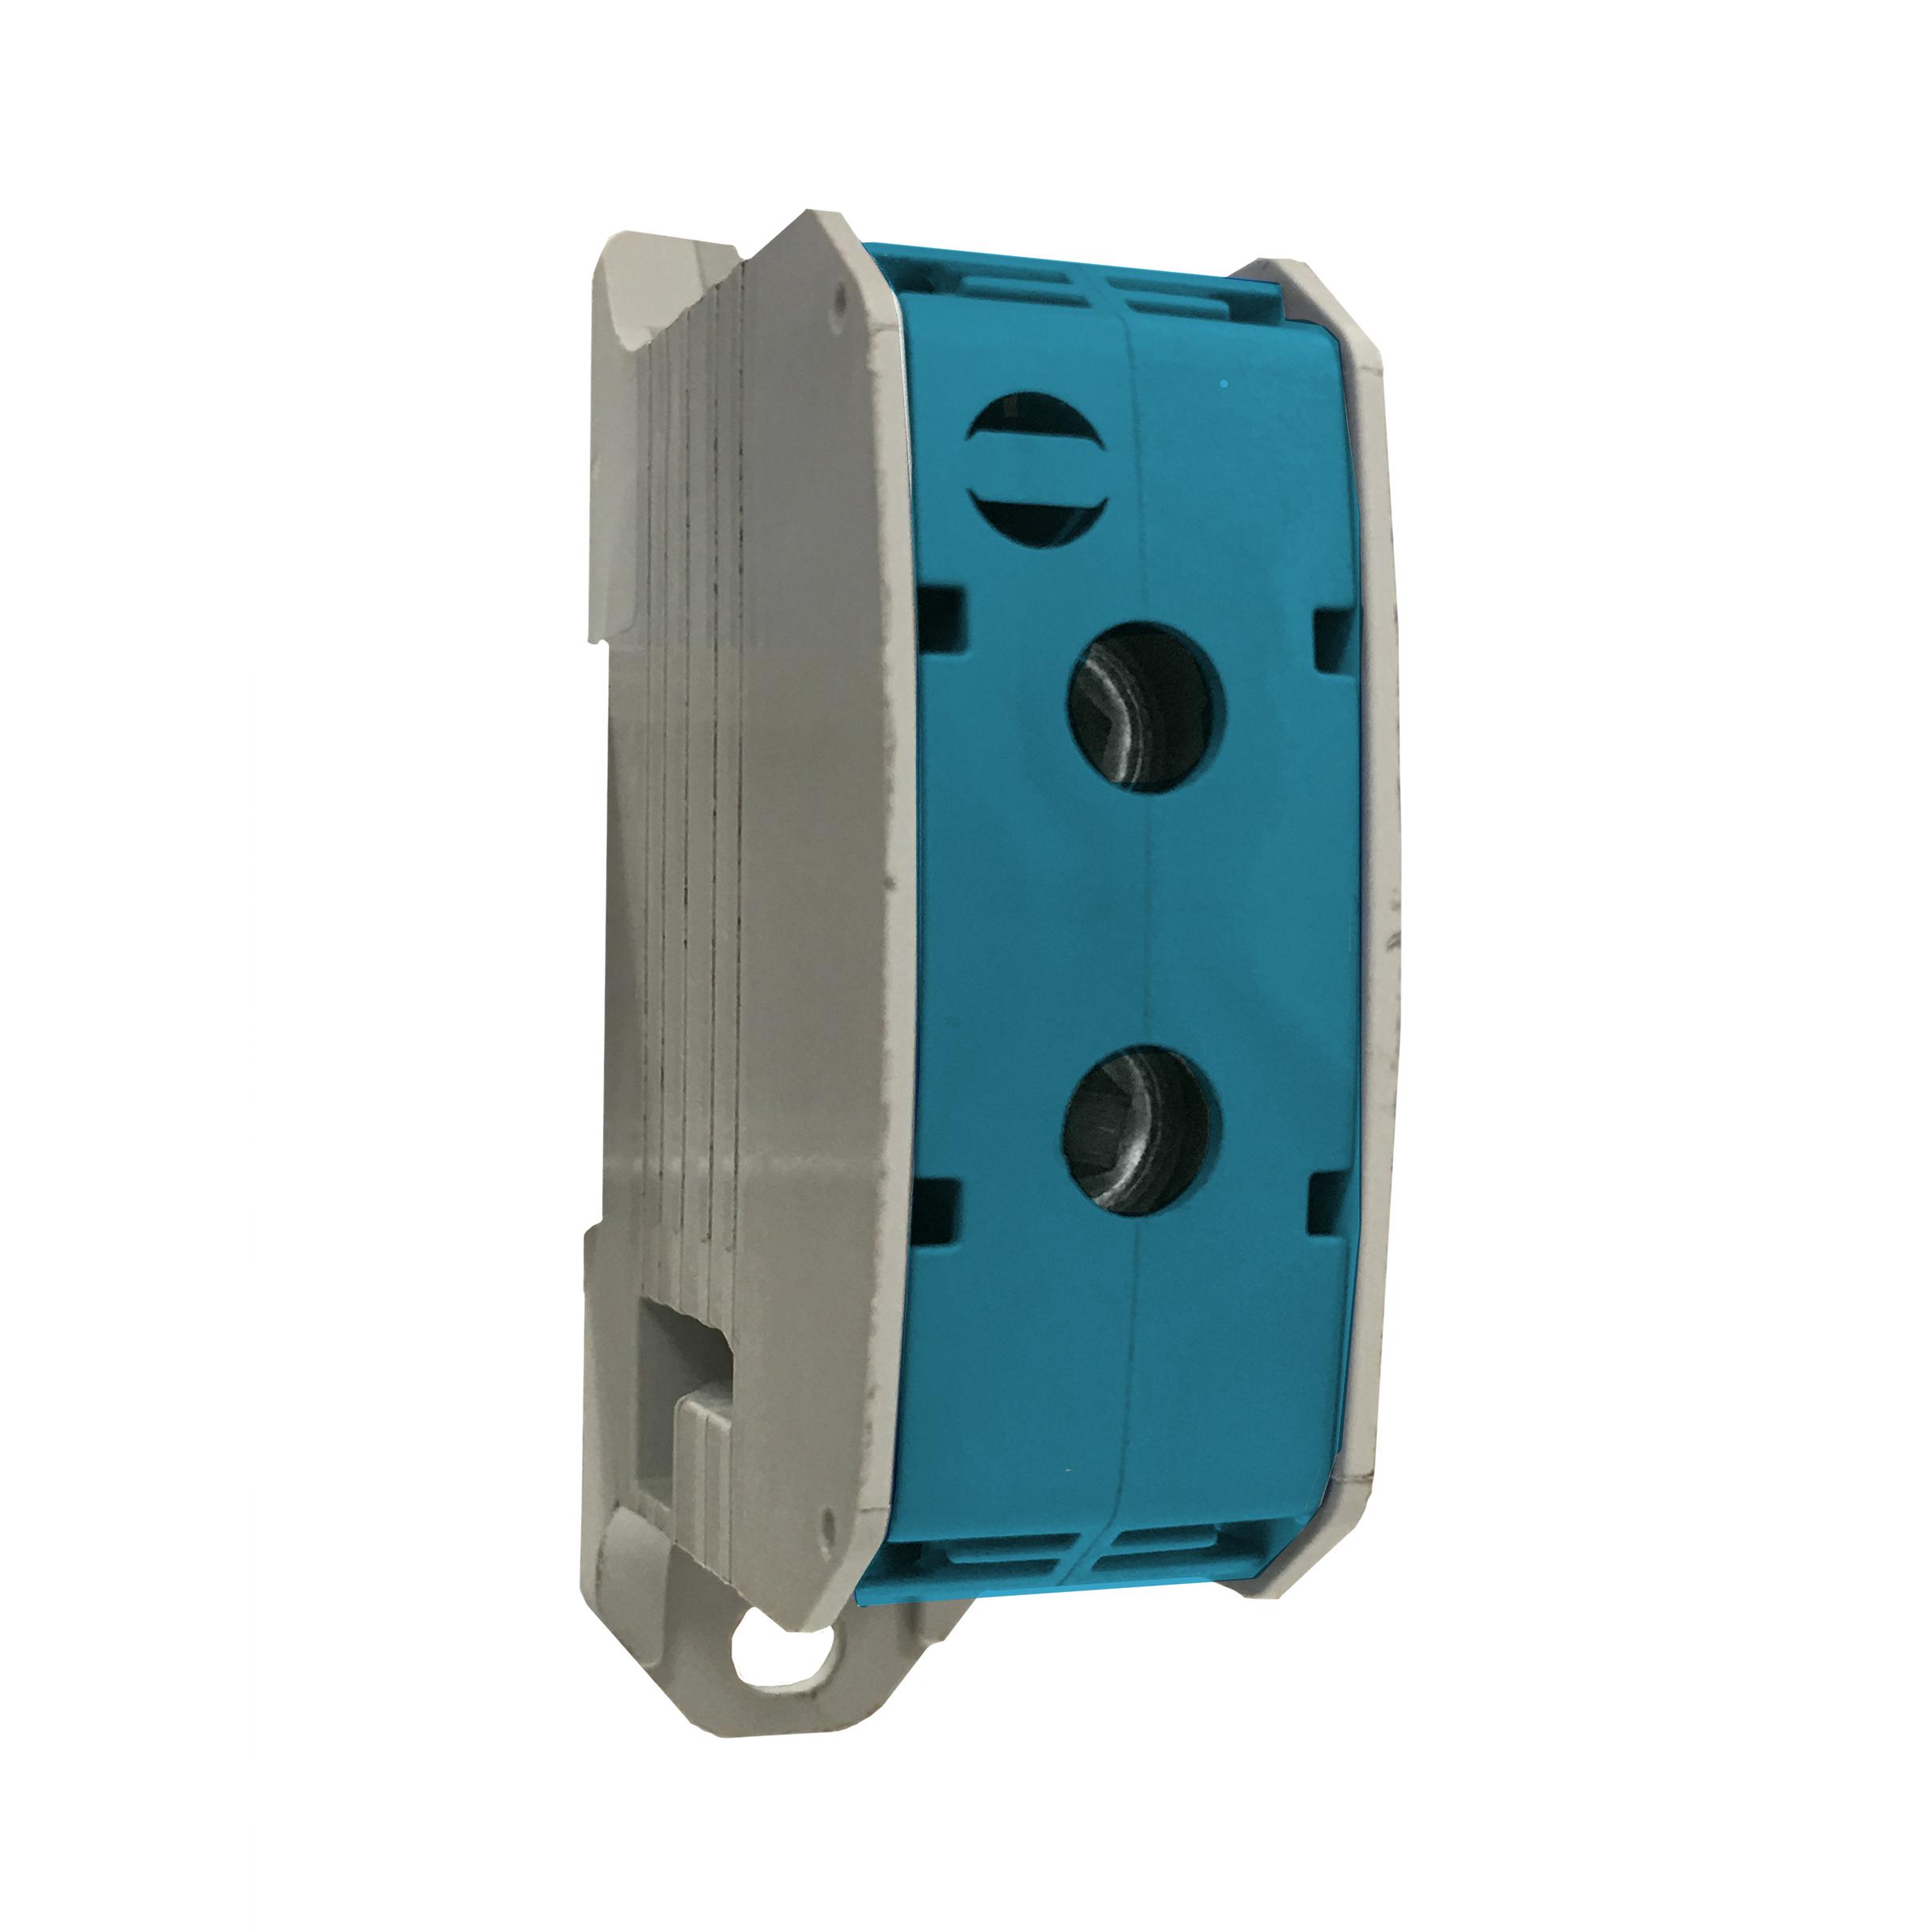 1 Stk Aluminium /Kupfer Klemme, 1-polig, 185mm² blau IKA21520--